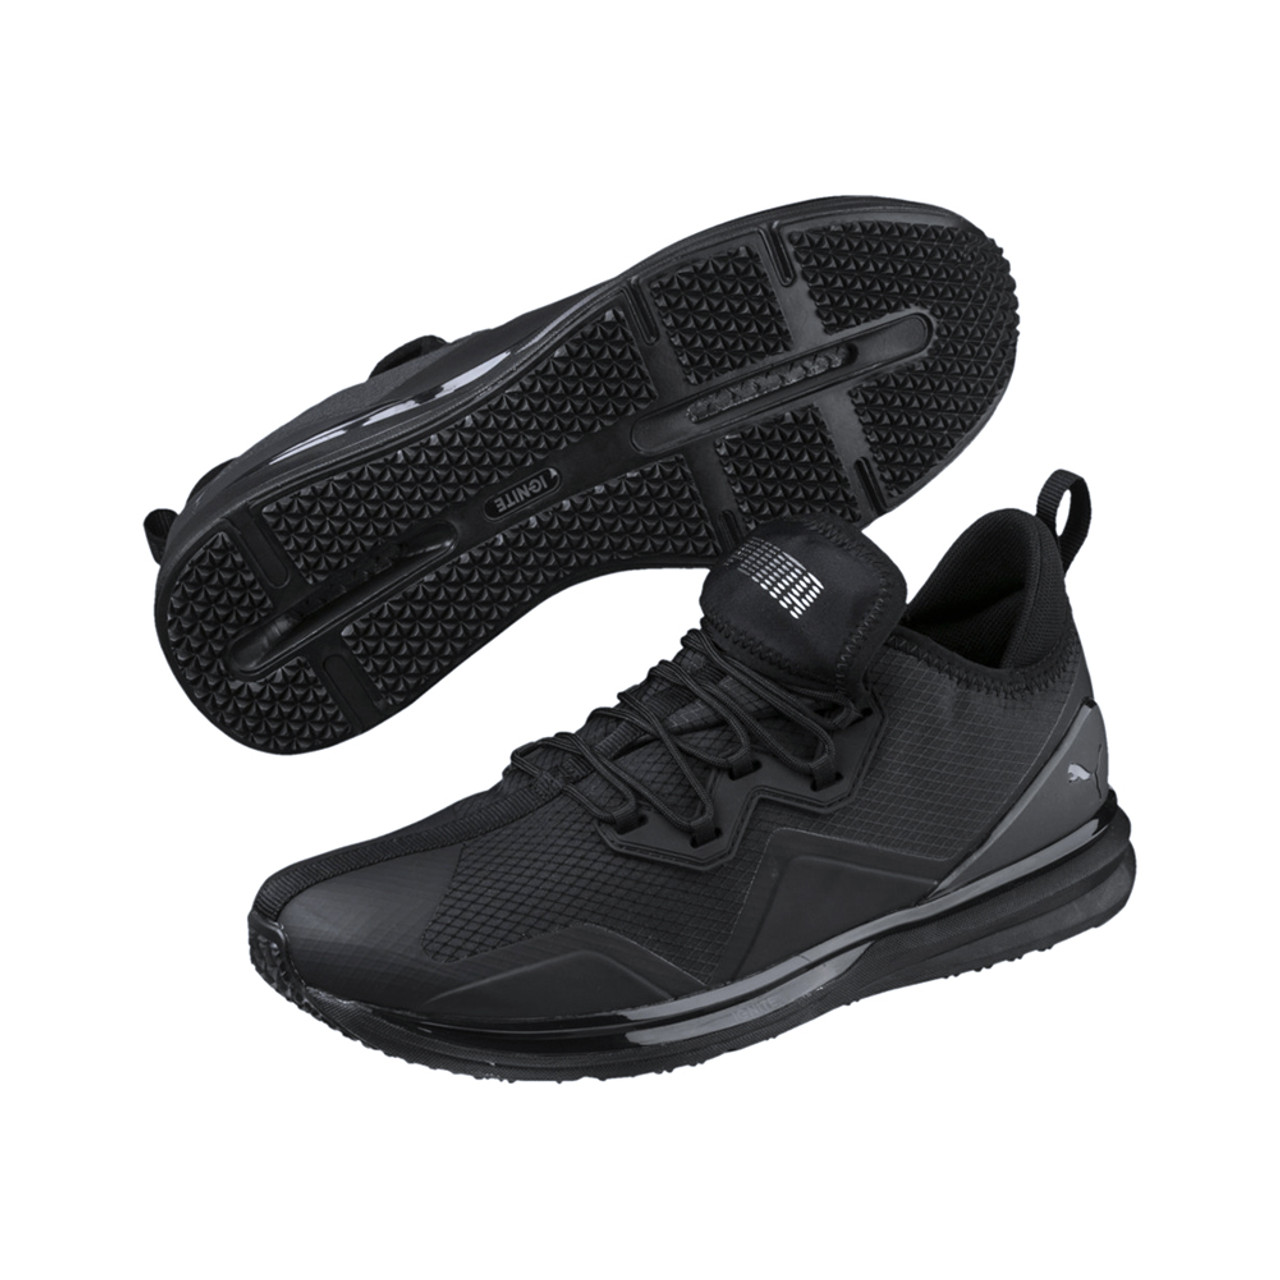 Puma Men s Ignite Limitless Initiate Running Shoe Black - Shop now    Shoolu.com 4a11c62b1